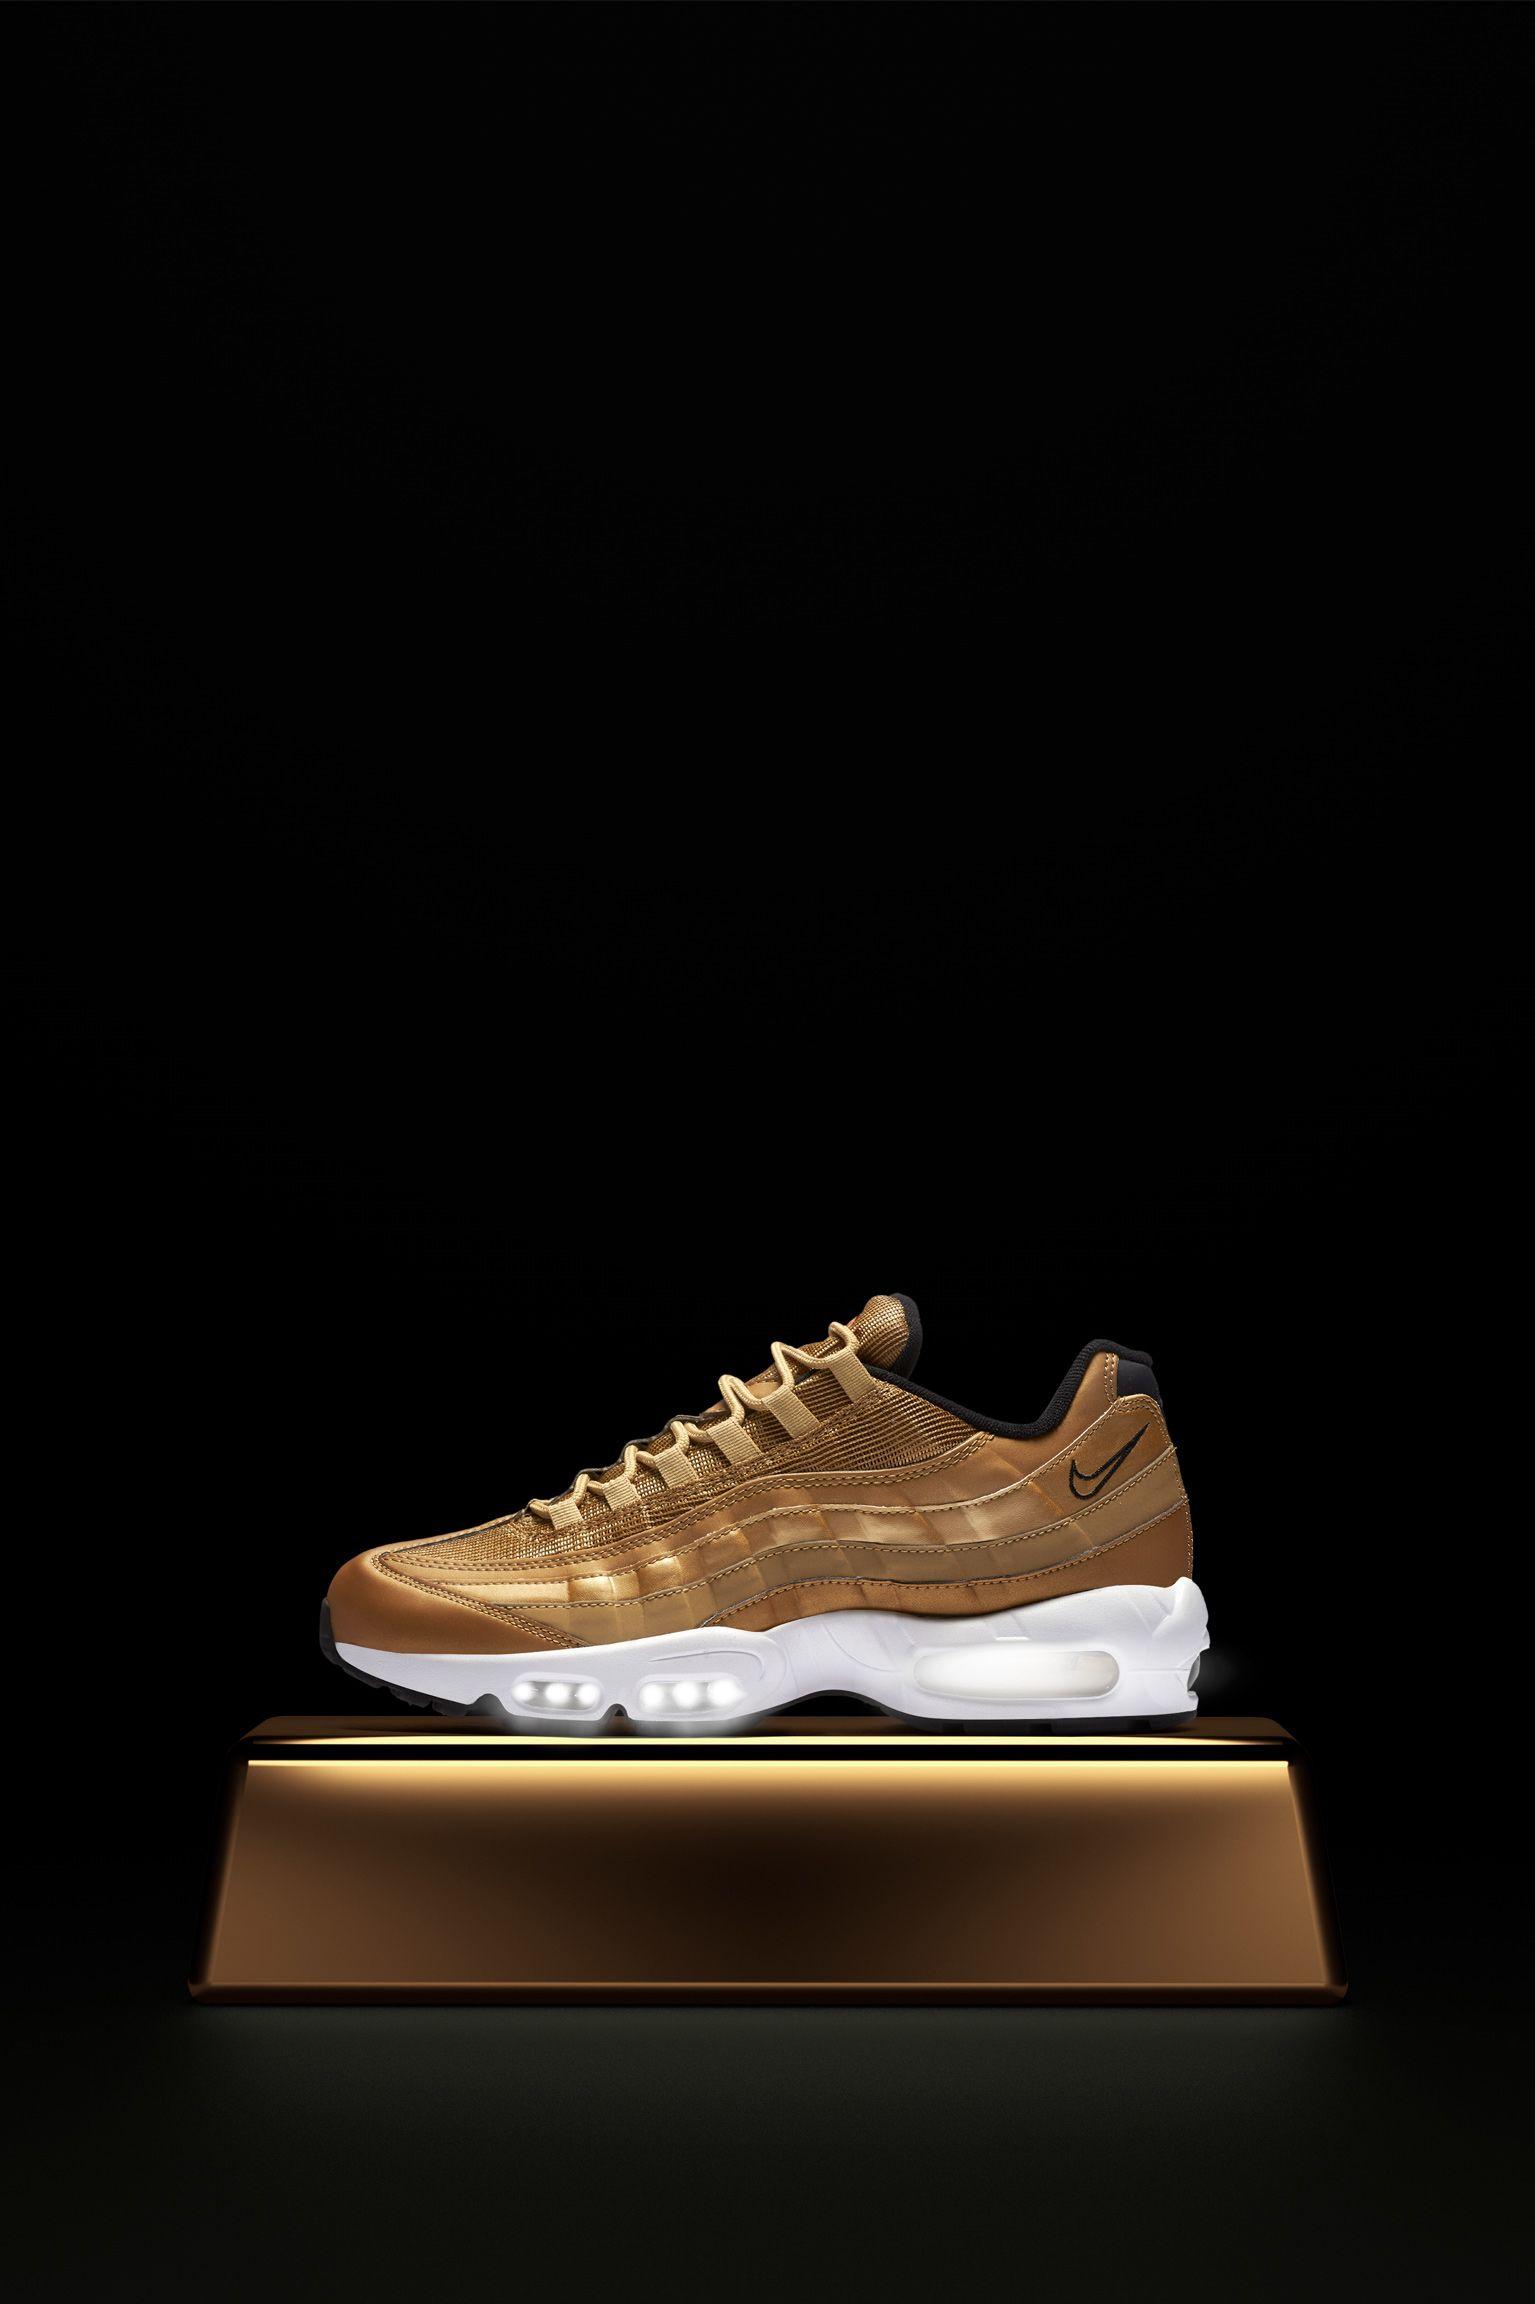 air max 95 uomo oro